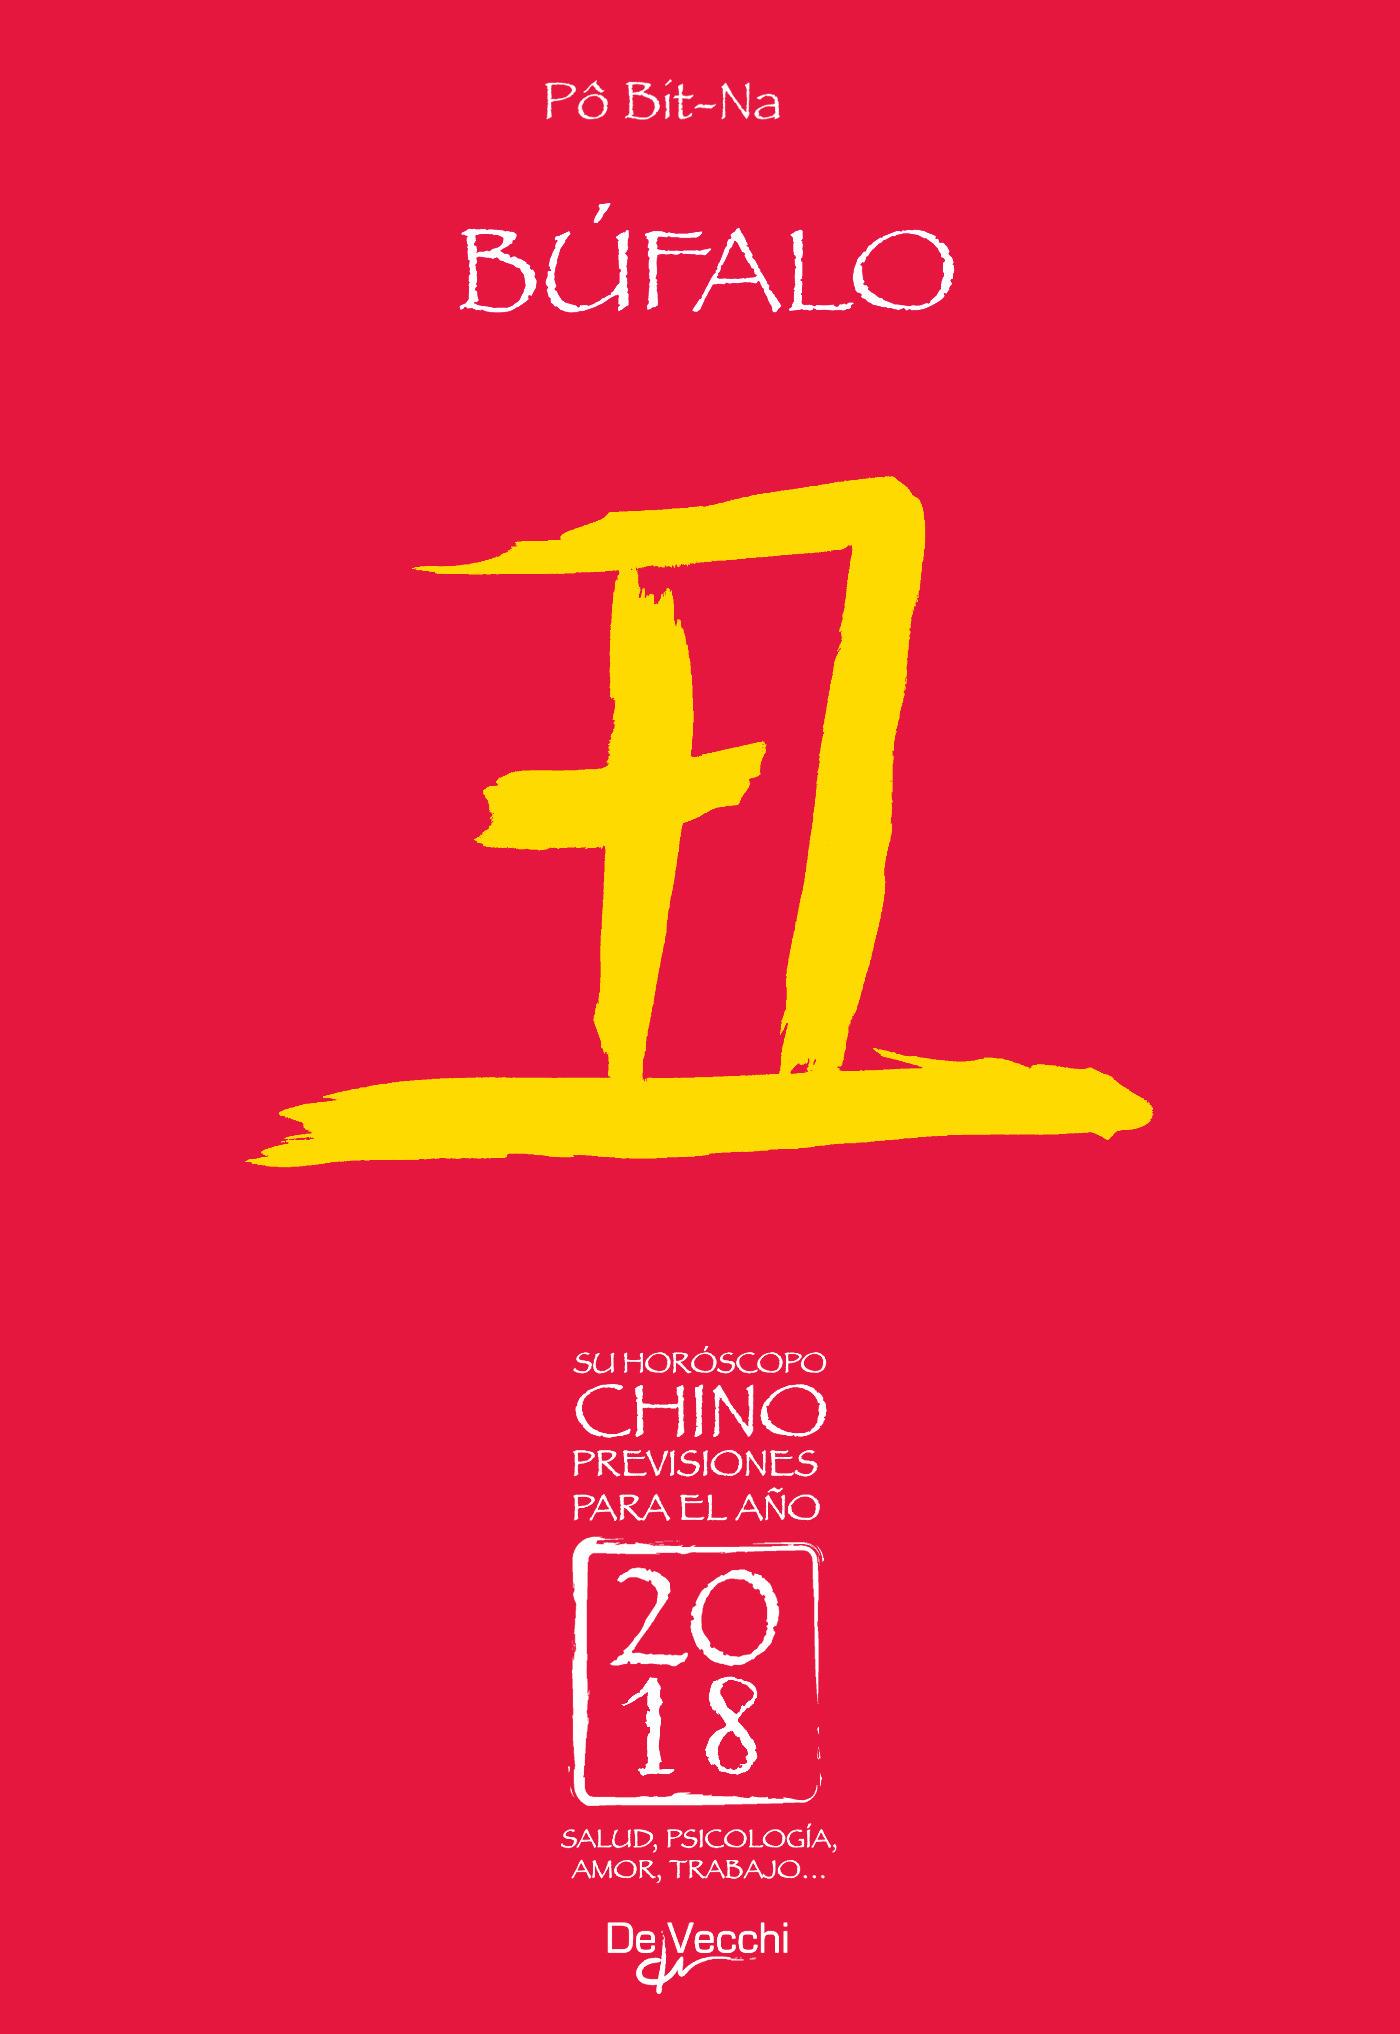 Bit-Na, Pô - Su horóscopo chino. Búfalo, ebook